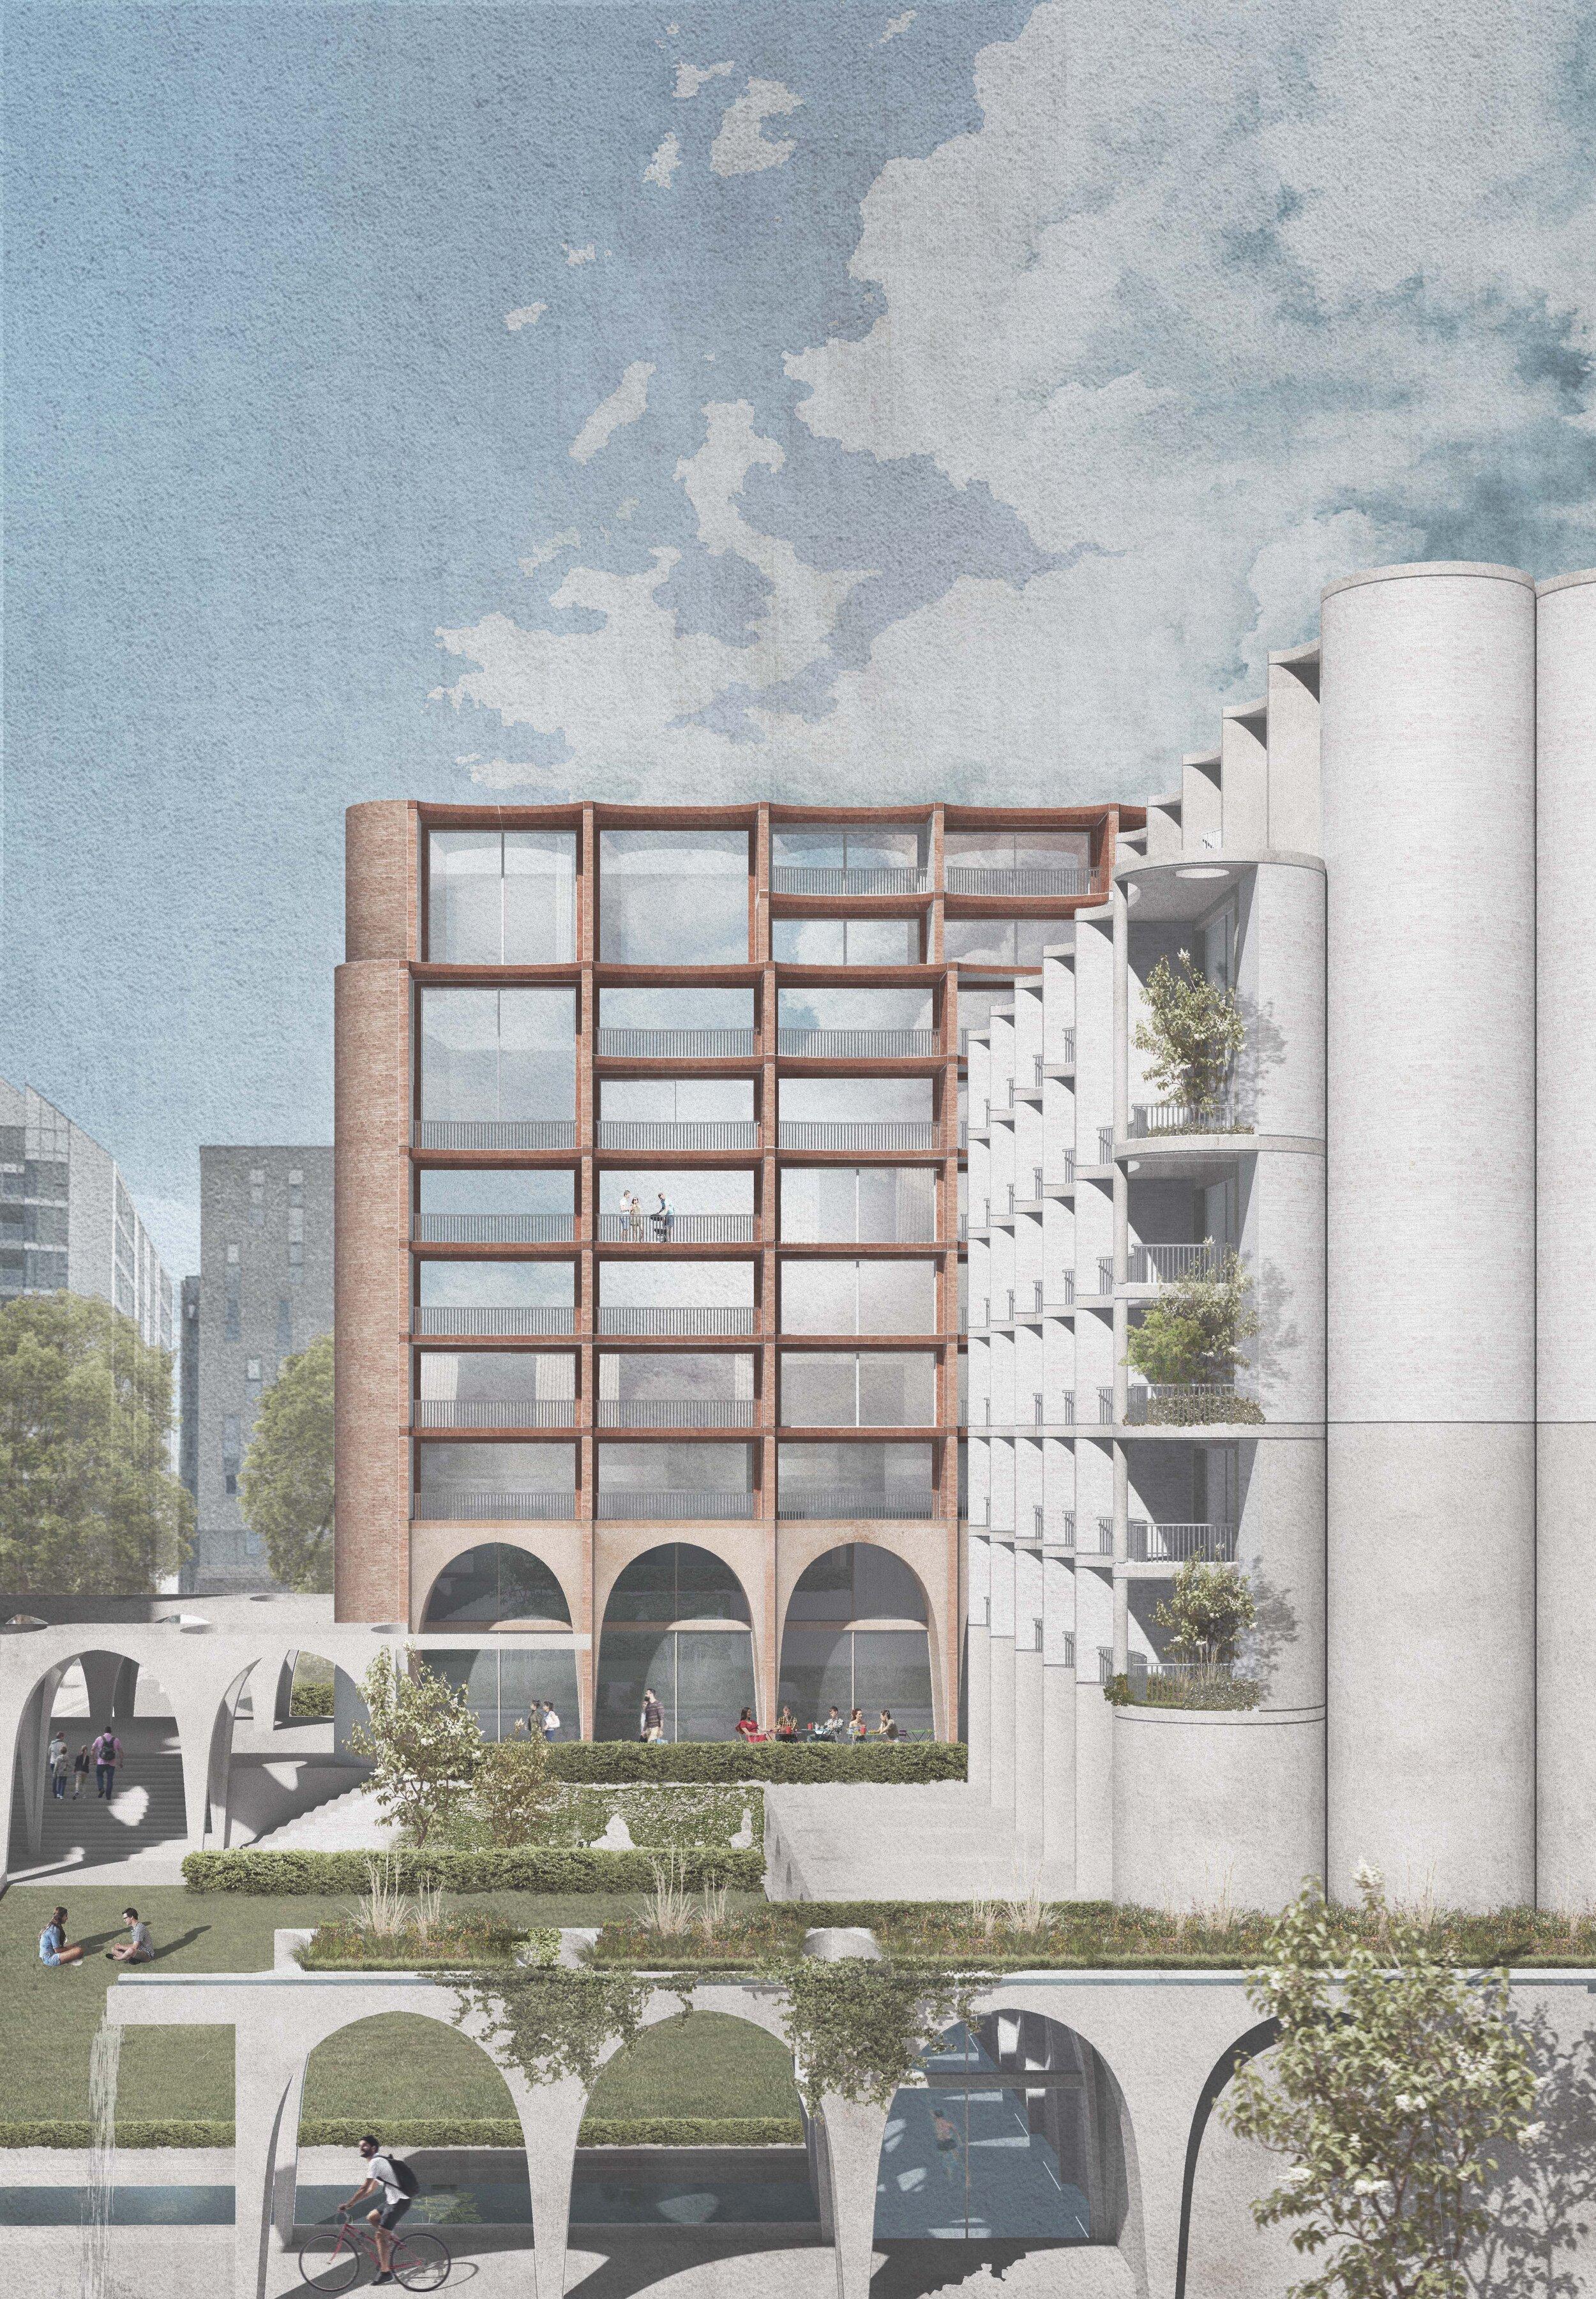 Wandleside Housing  Multi Unit Development -  London